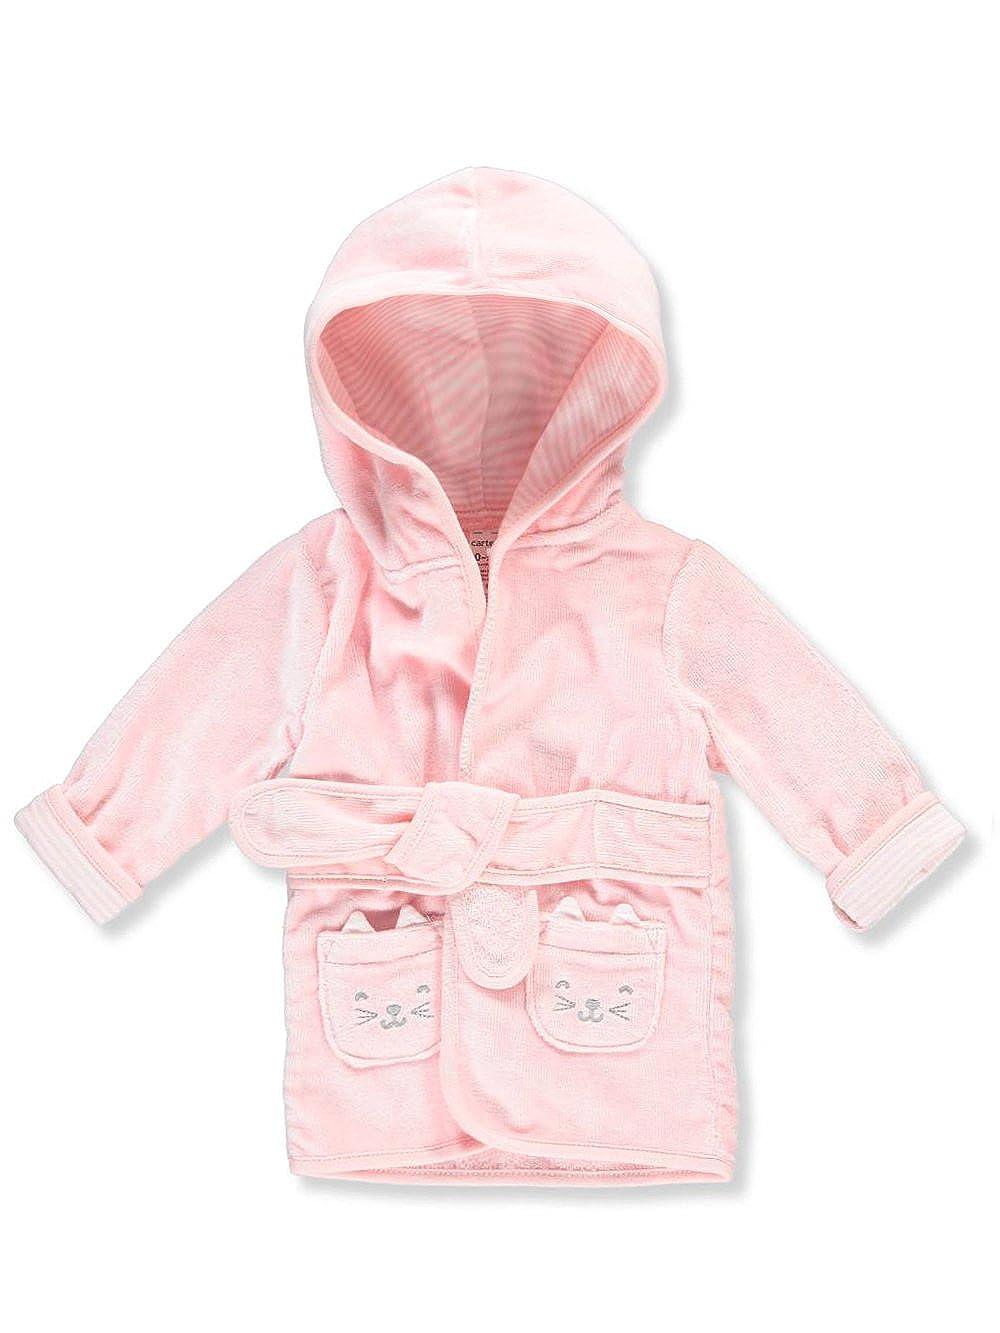 Carter's Baby's Hooded Robe Blue) Carter' s